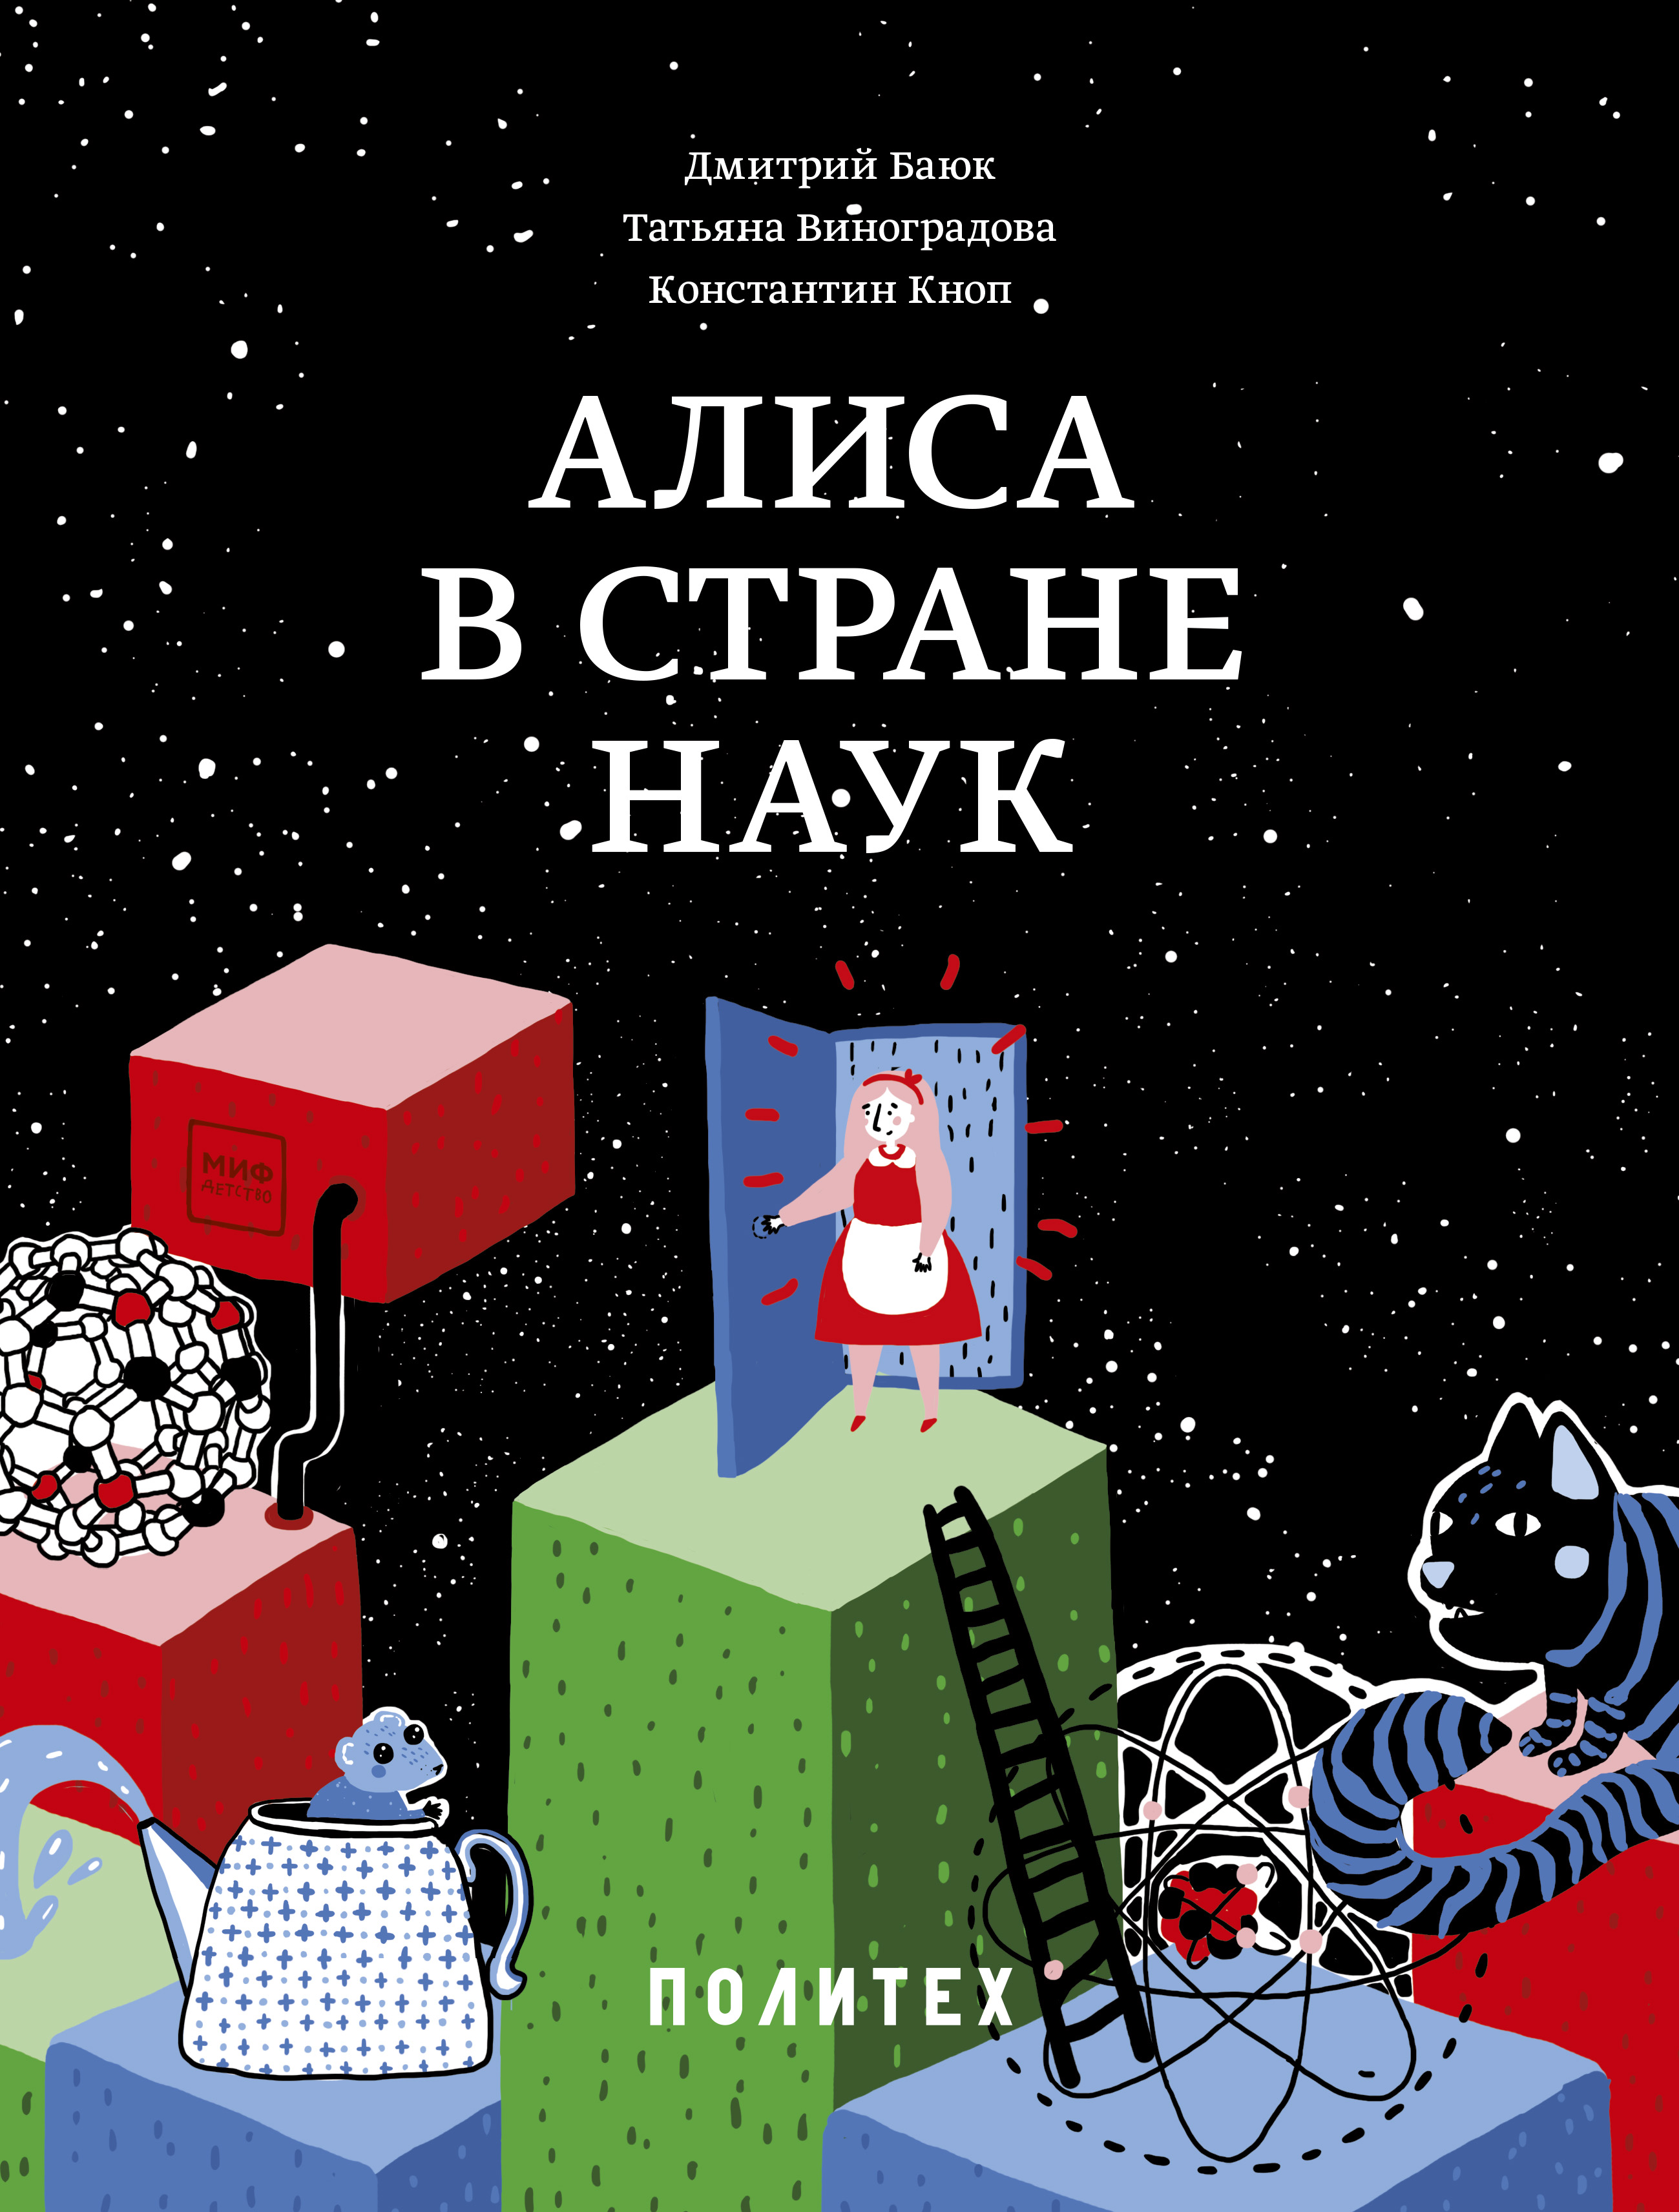 Алиса в Стране наук ( Дмитрий Баюк, Татьяна Виноградова, Константин Кноп  )